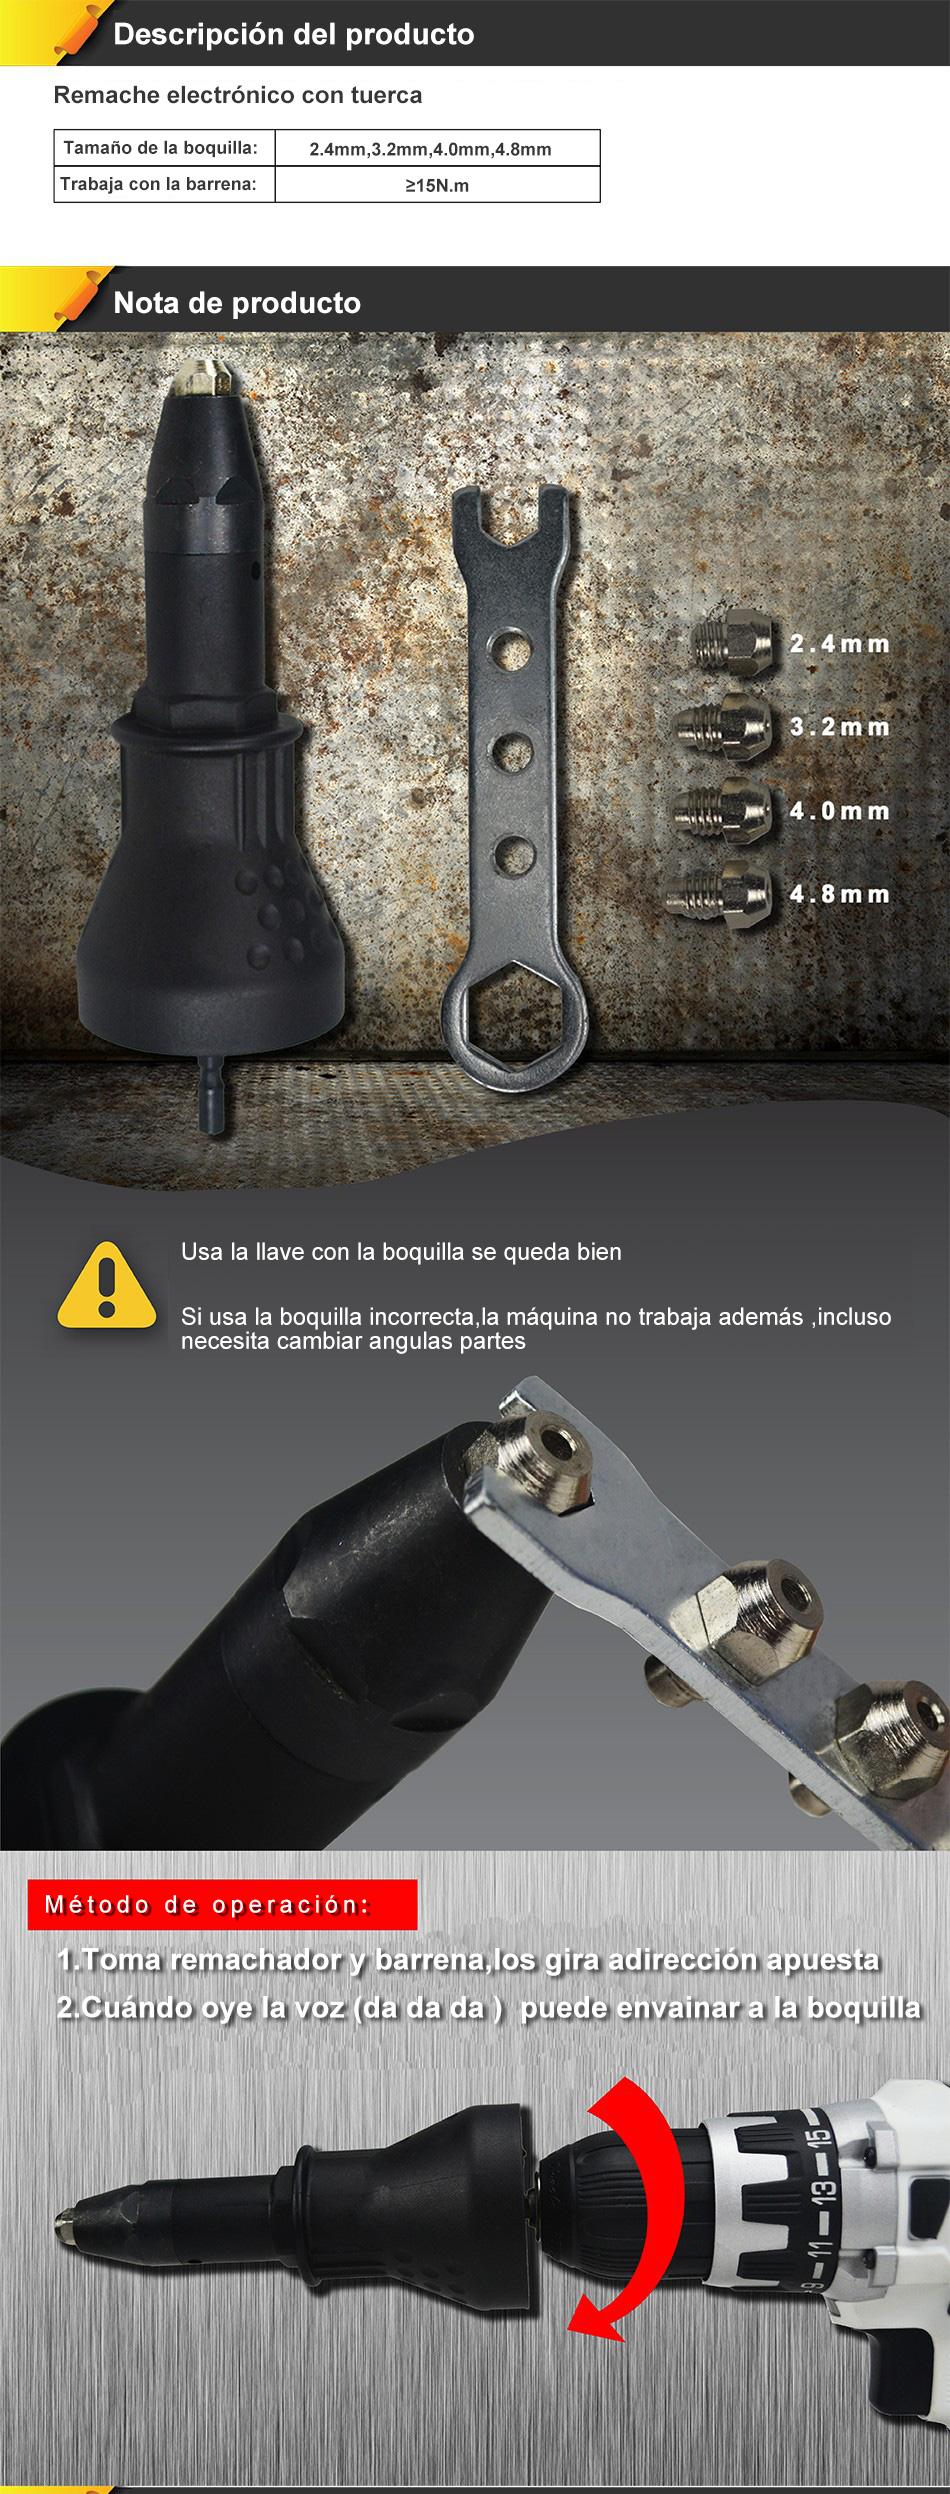 DEKO Electric Rivet Nut Gun Riveting Tool Cordless Riveting Drill Adaptor Insert Nut Tool